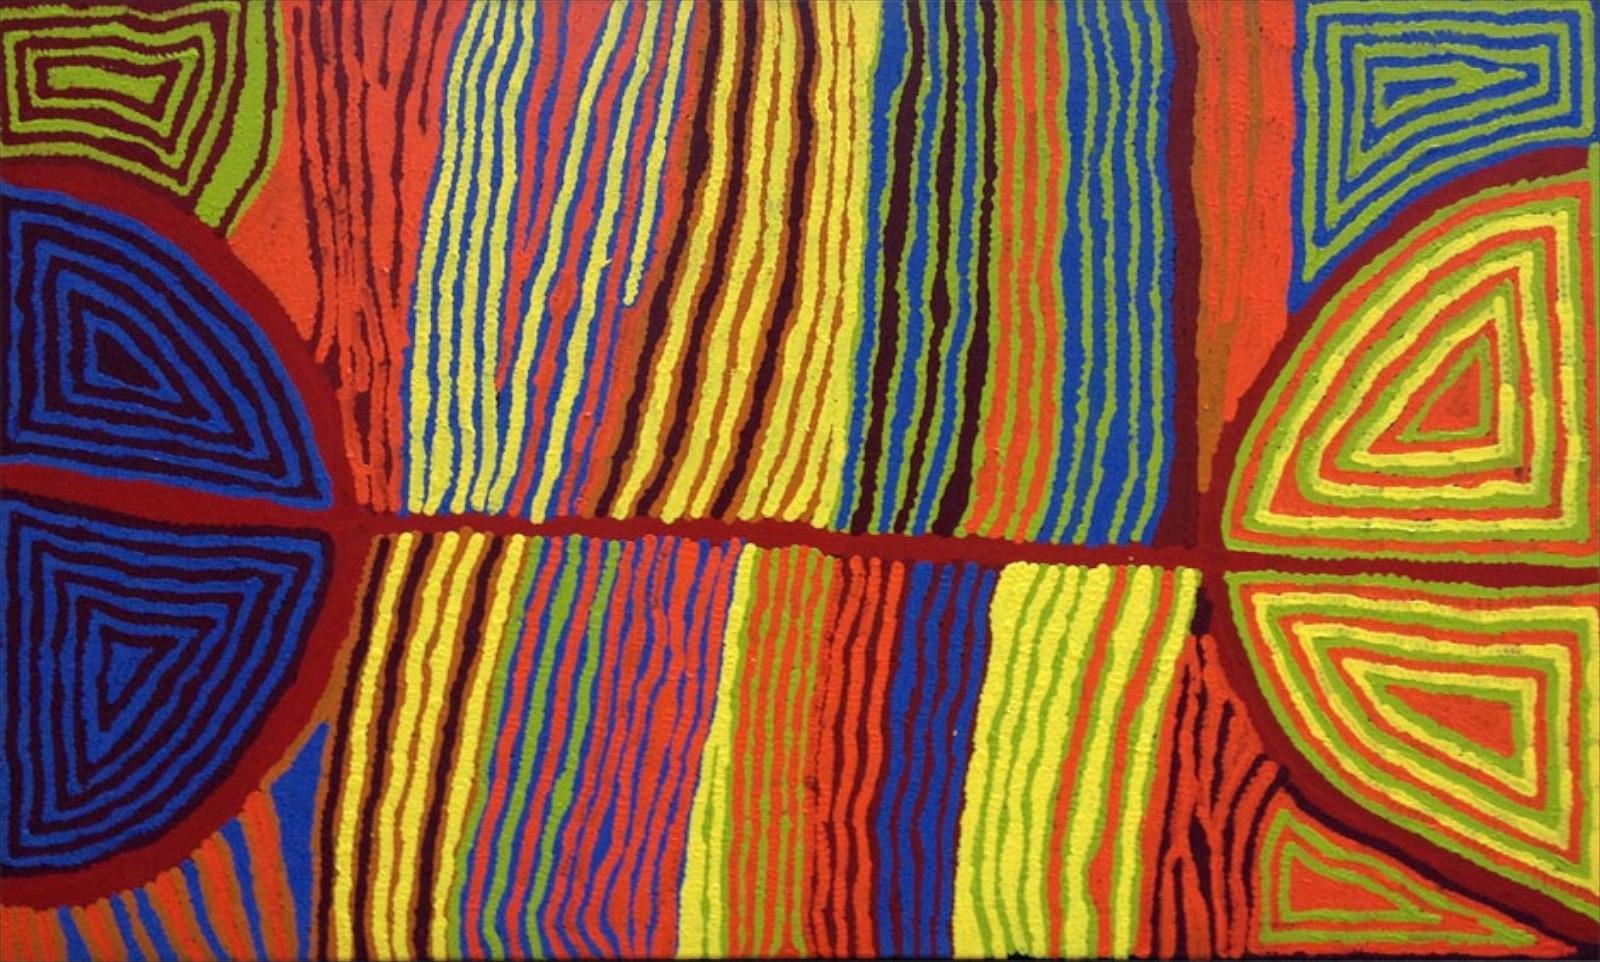 Judy Watson Napangardi150cm x 90cm #13589